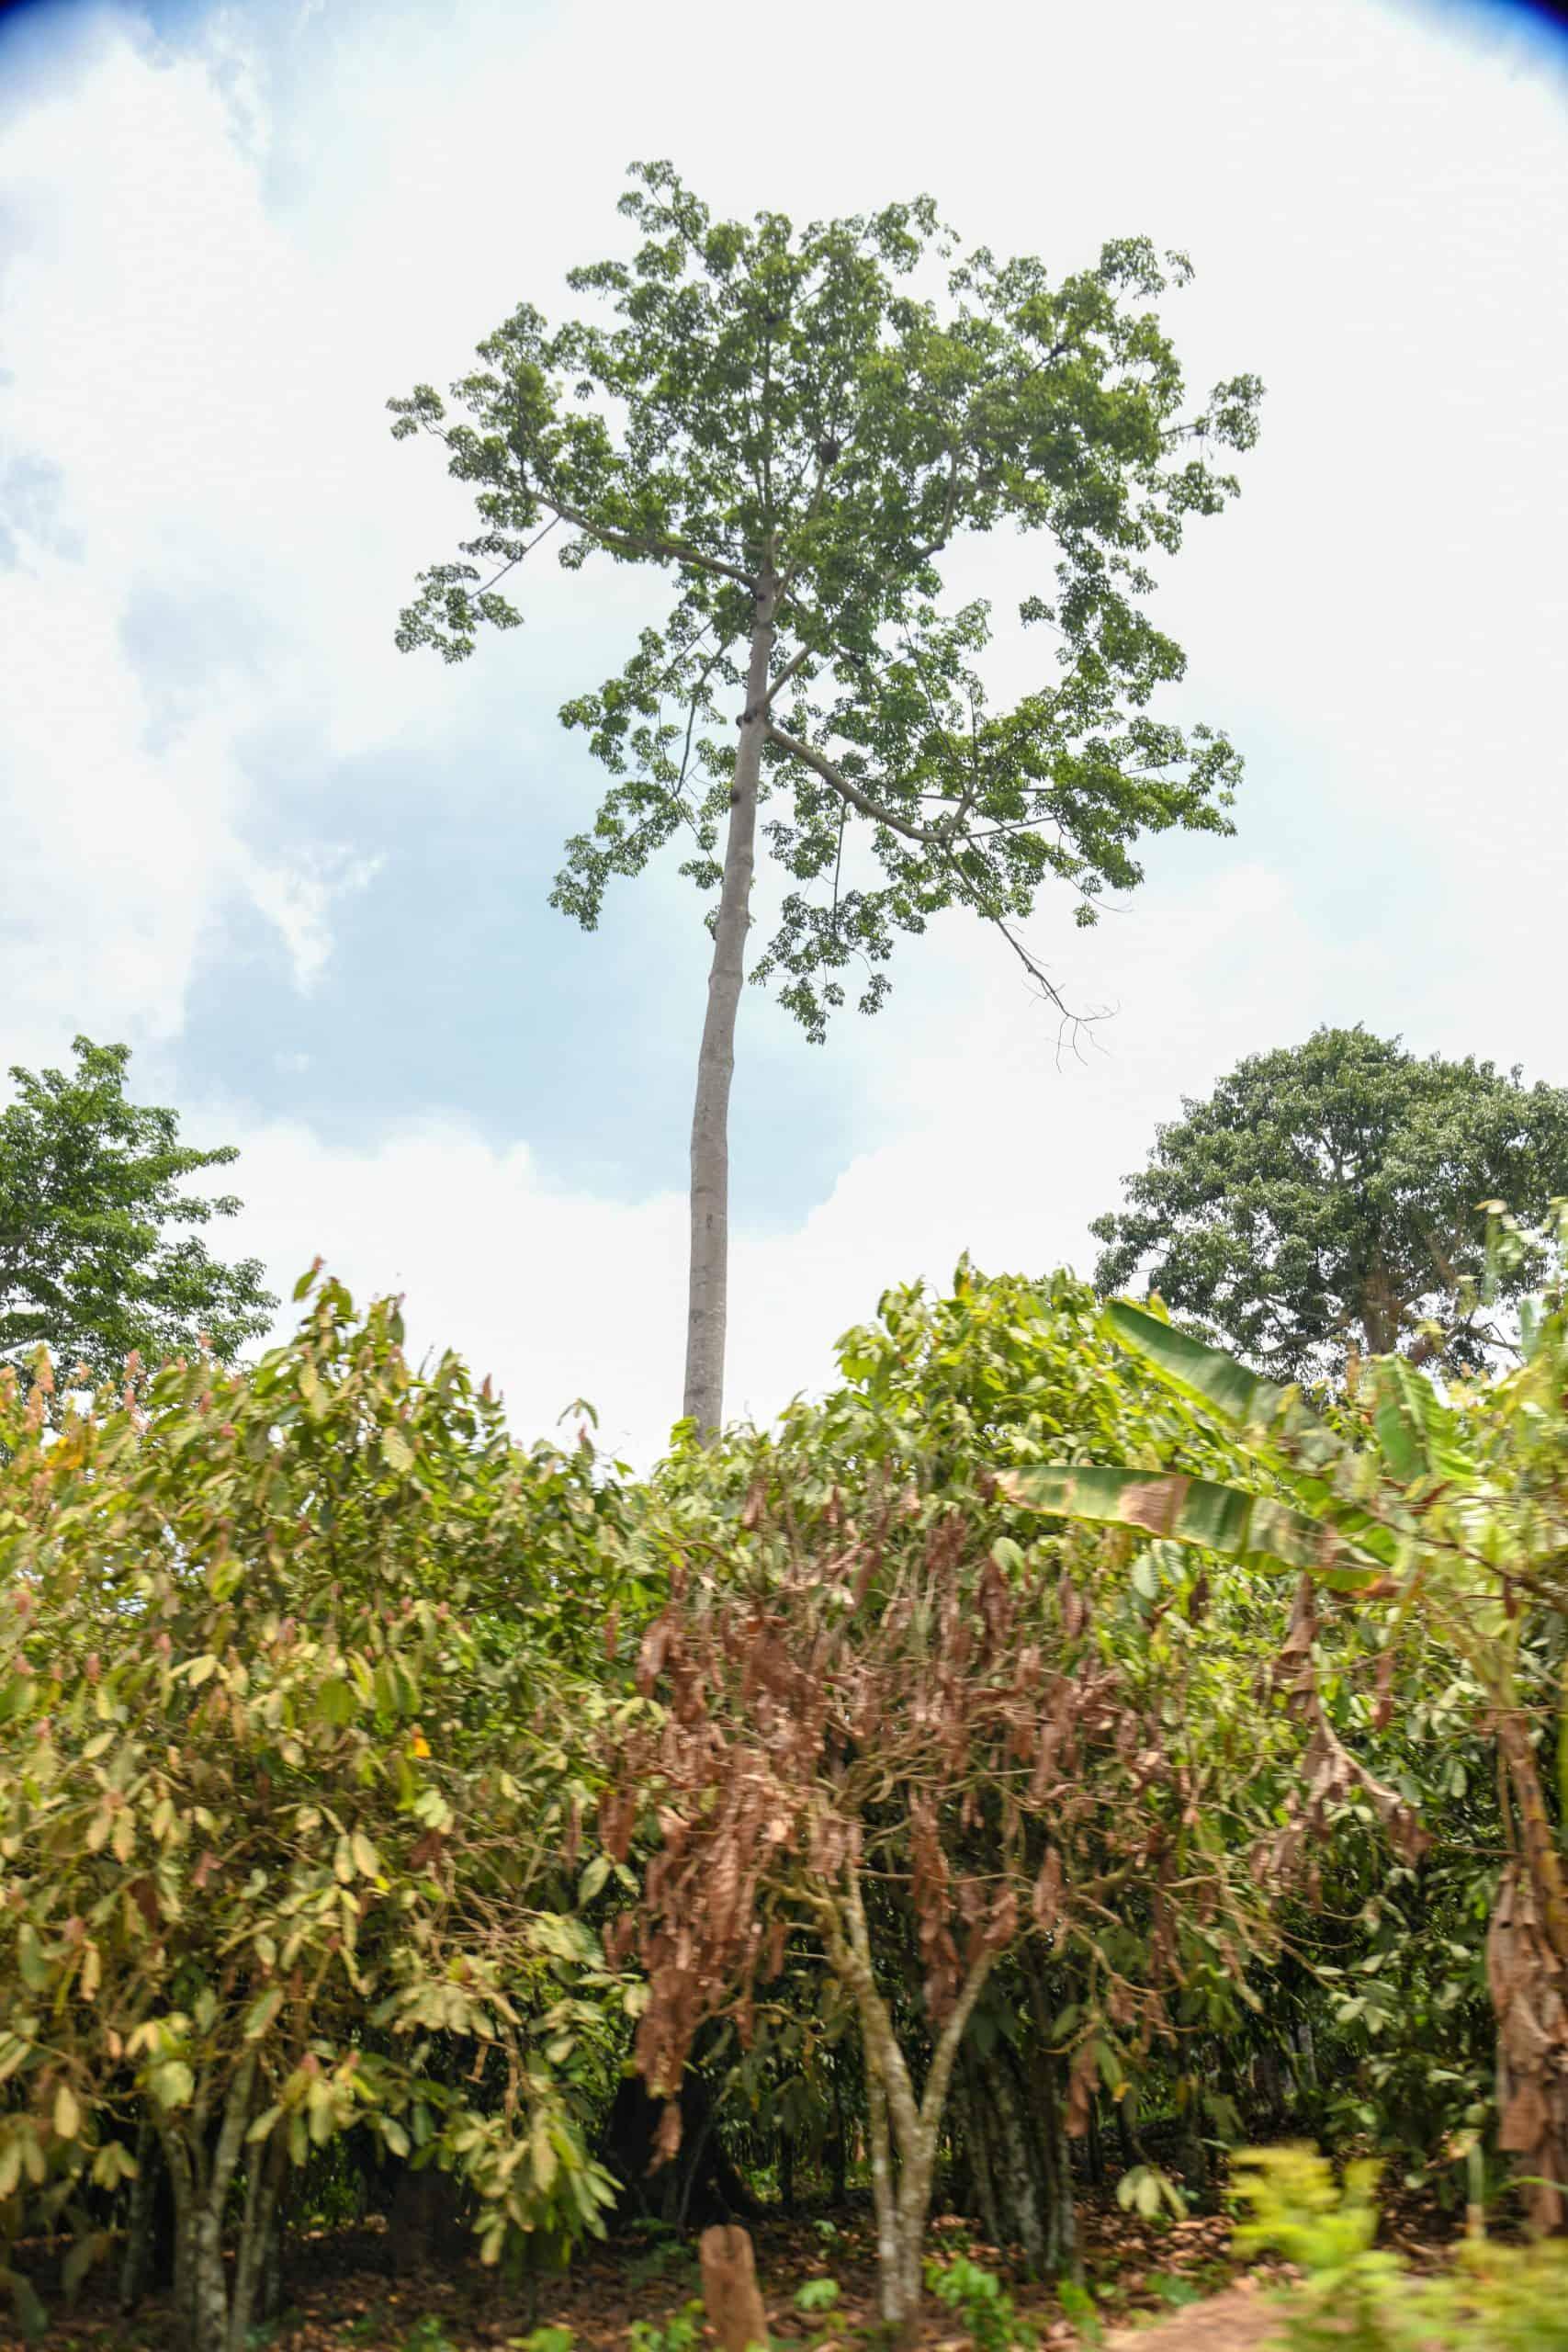 Agroforestry on a cocoa farm in Ghana